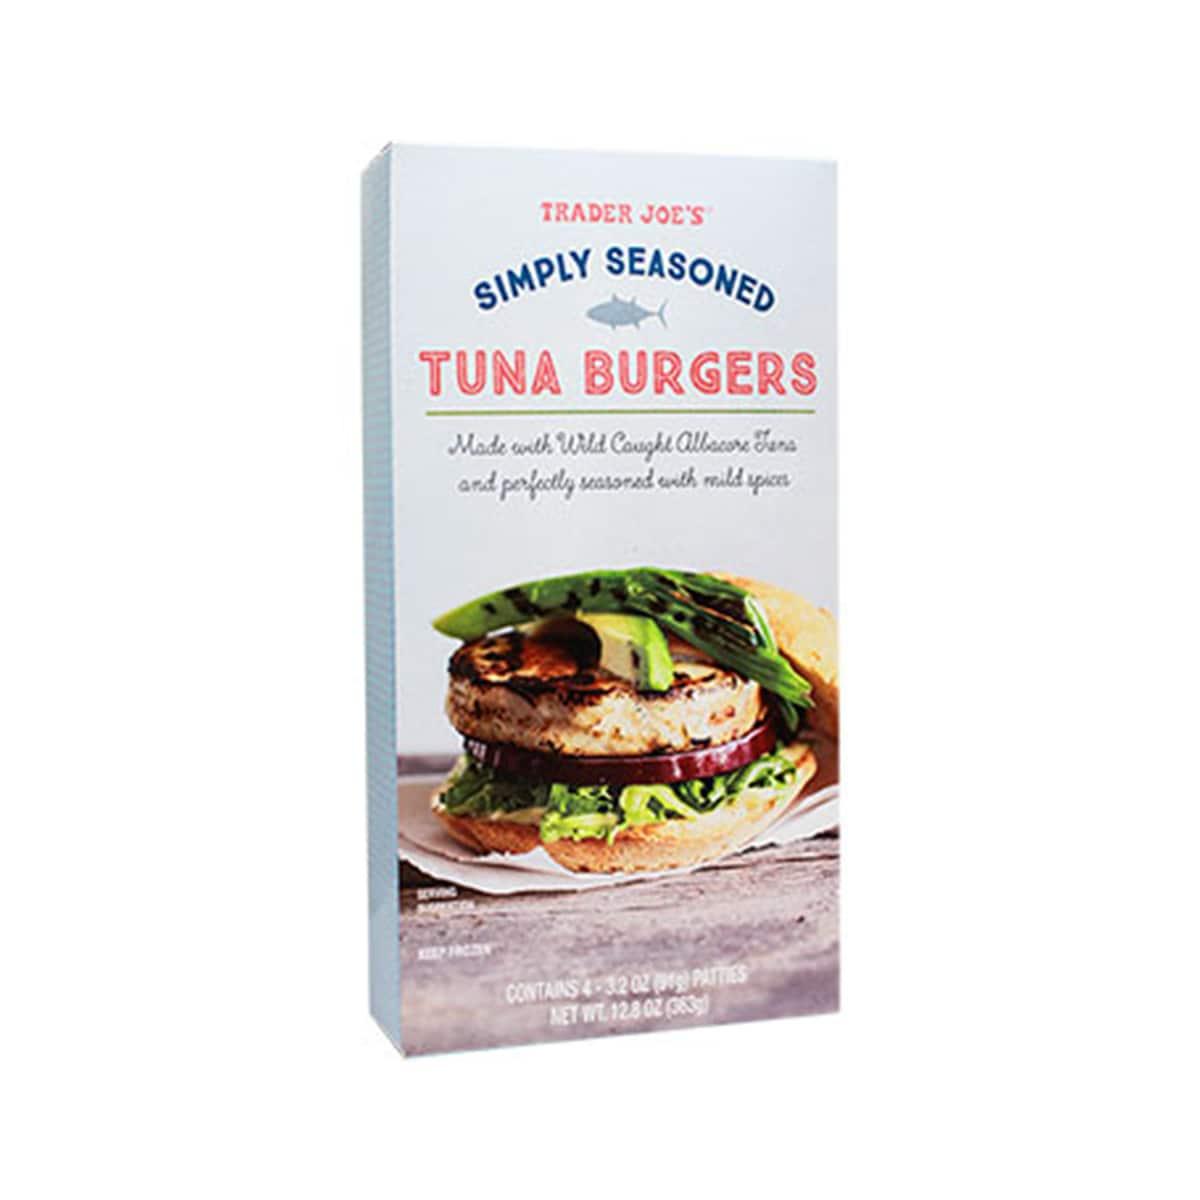 Simply Seasoned Tuna Burgers